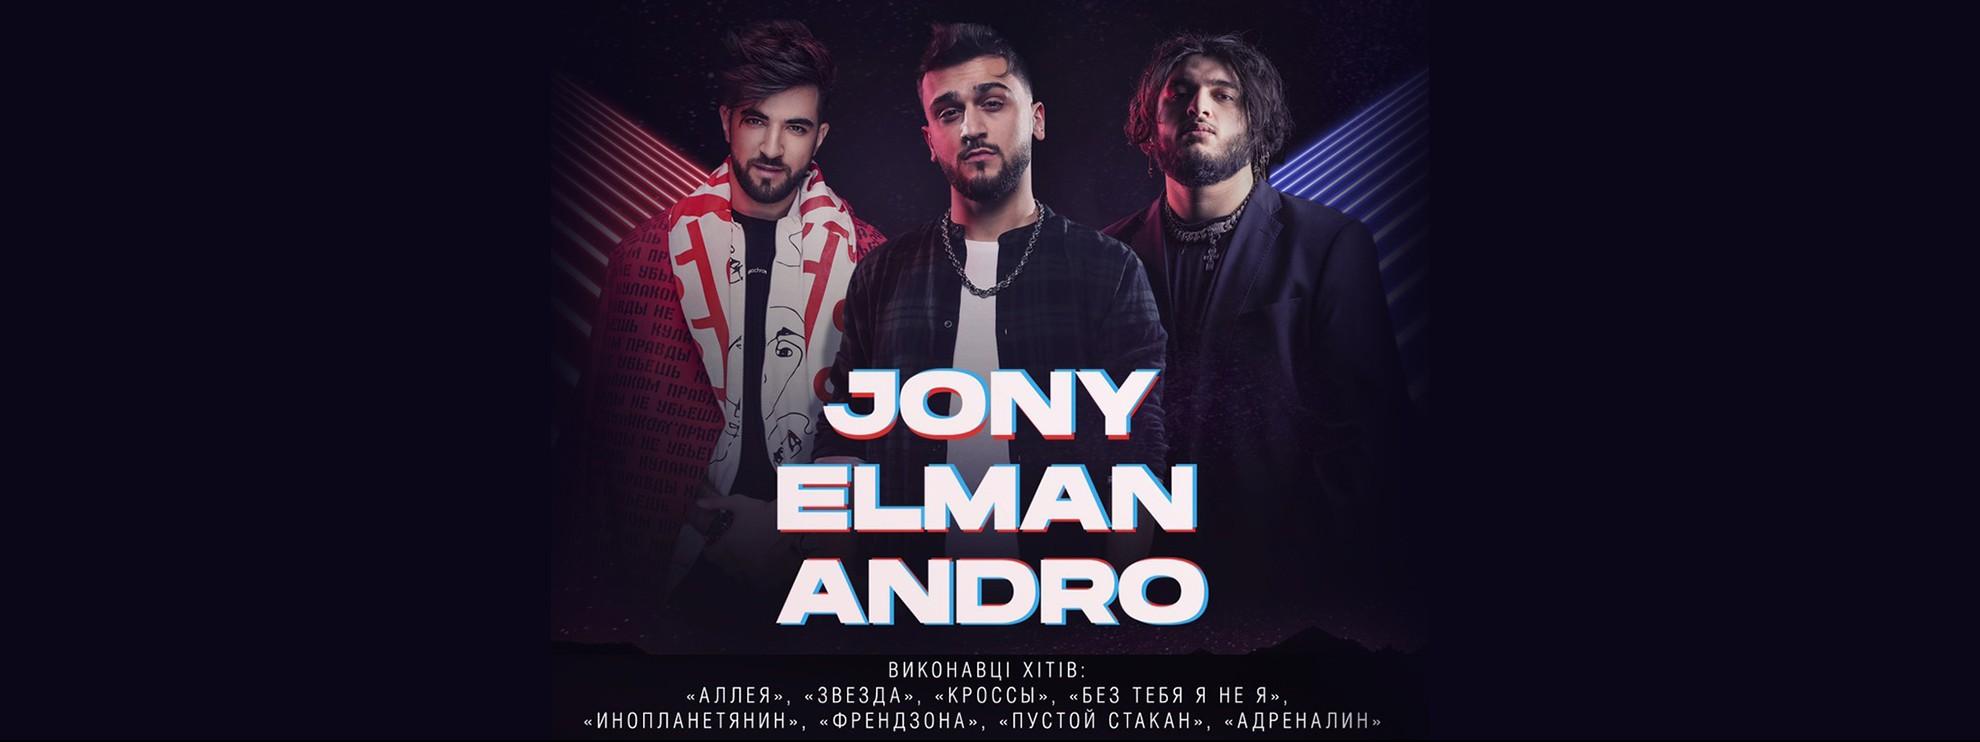 event Jony, El